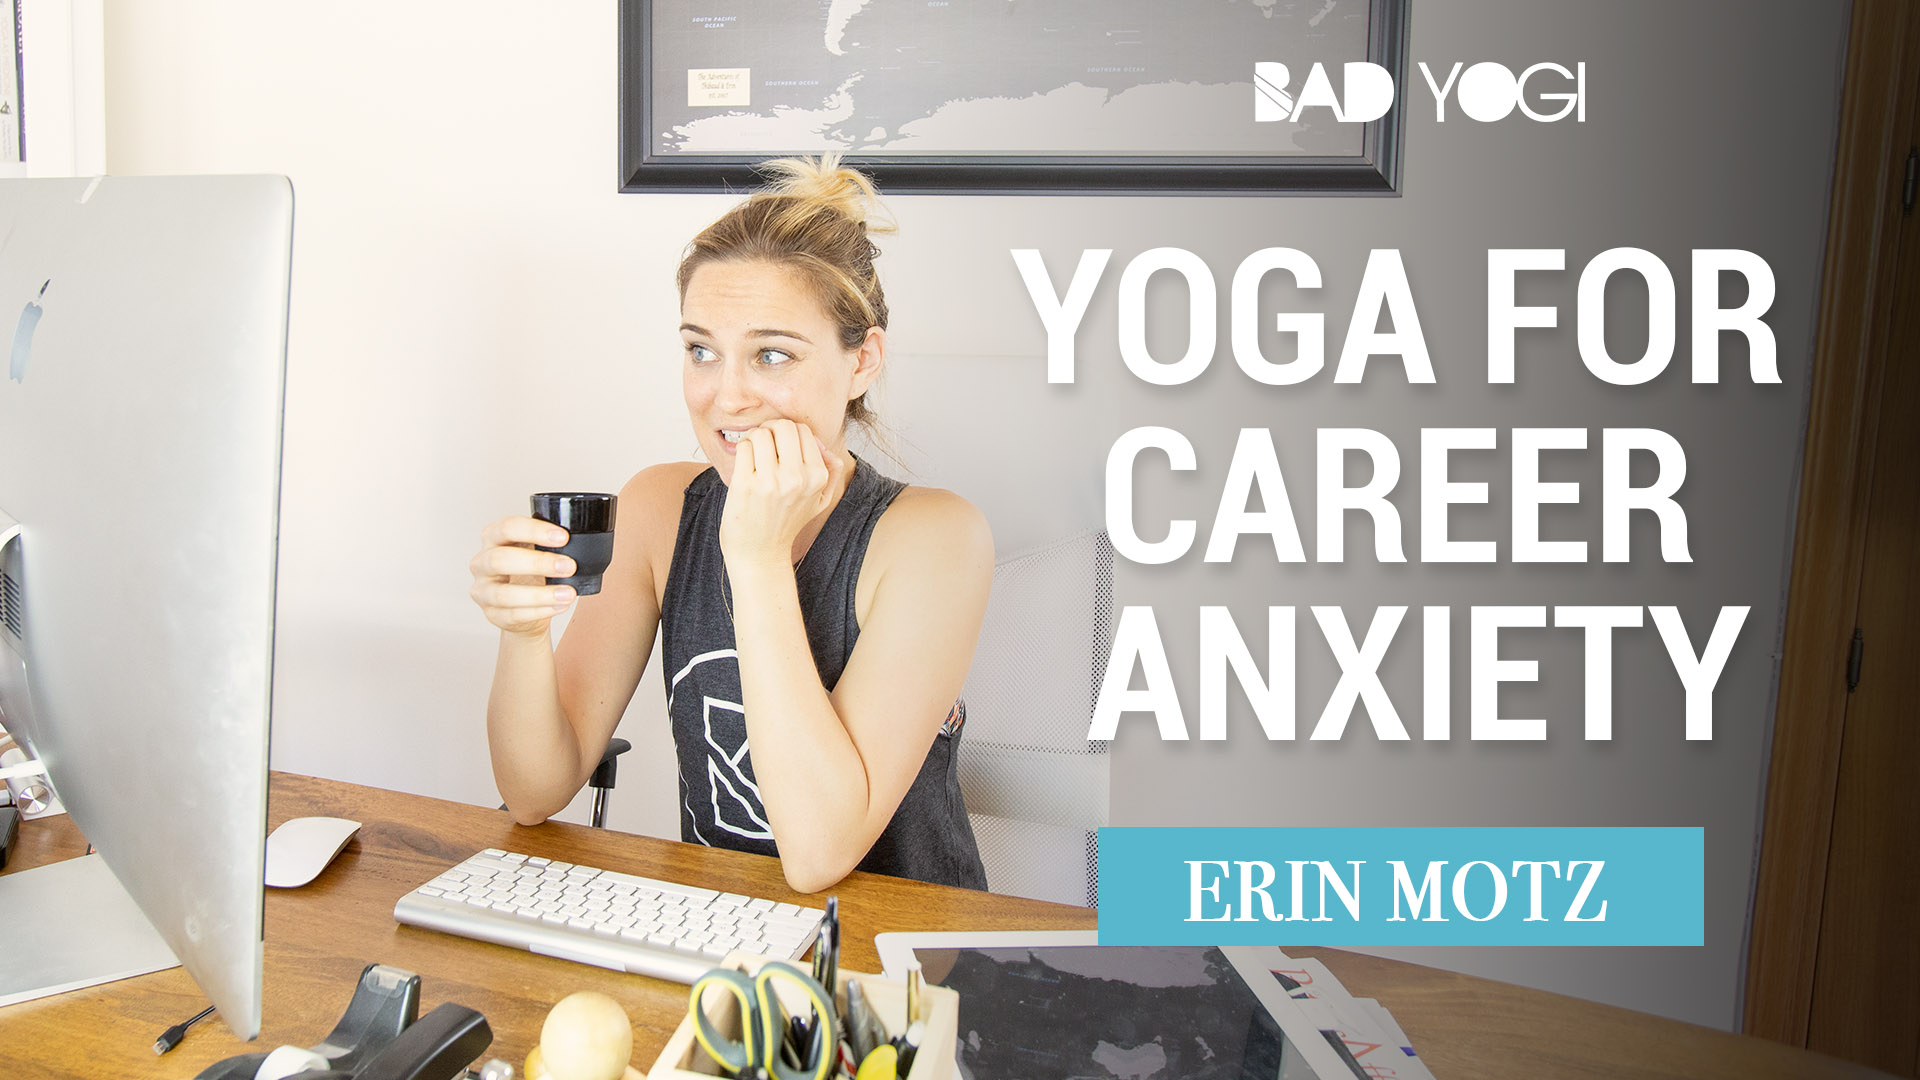 Bad Yogi Yoga for Career Anxiety